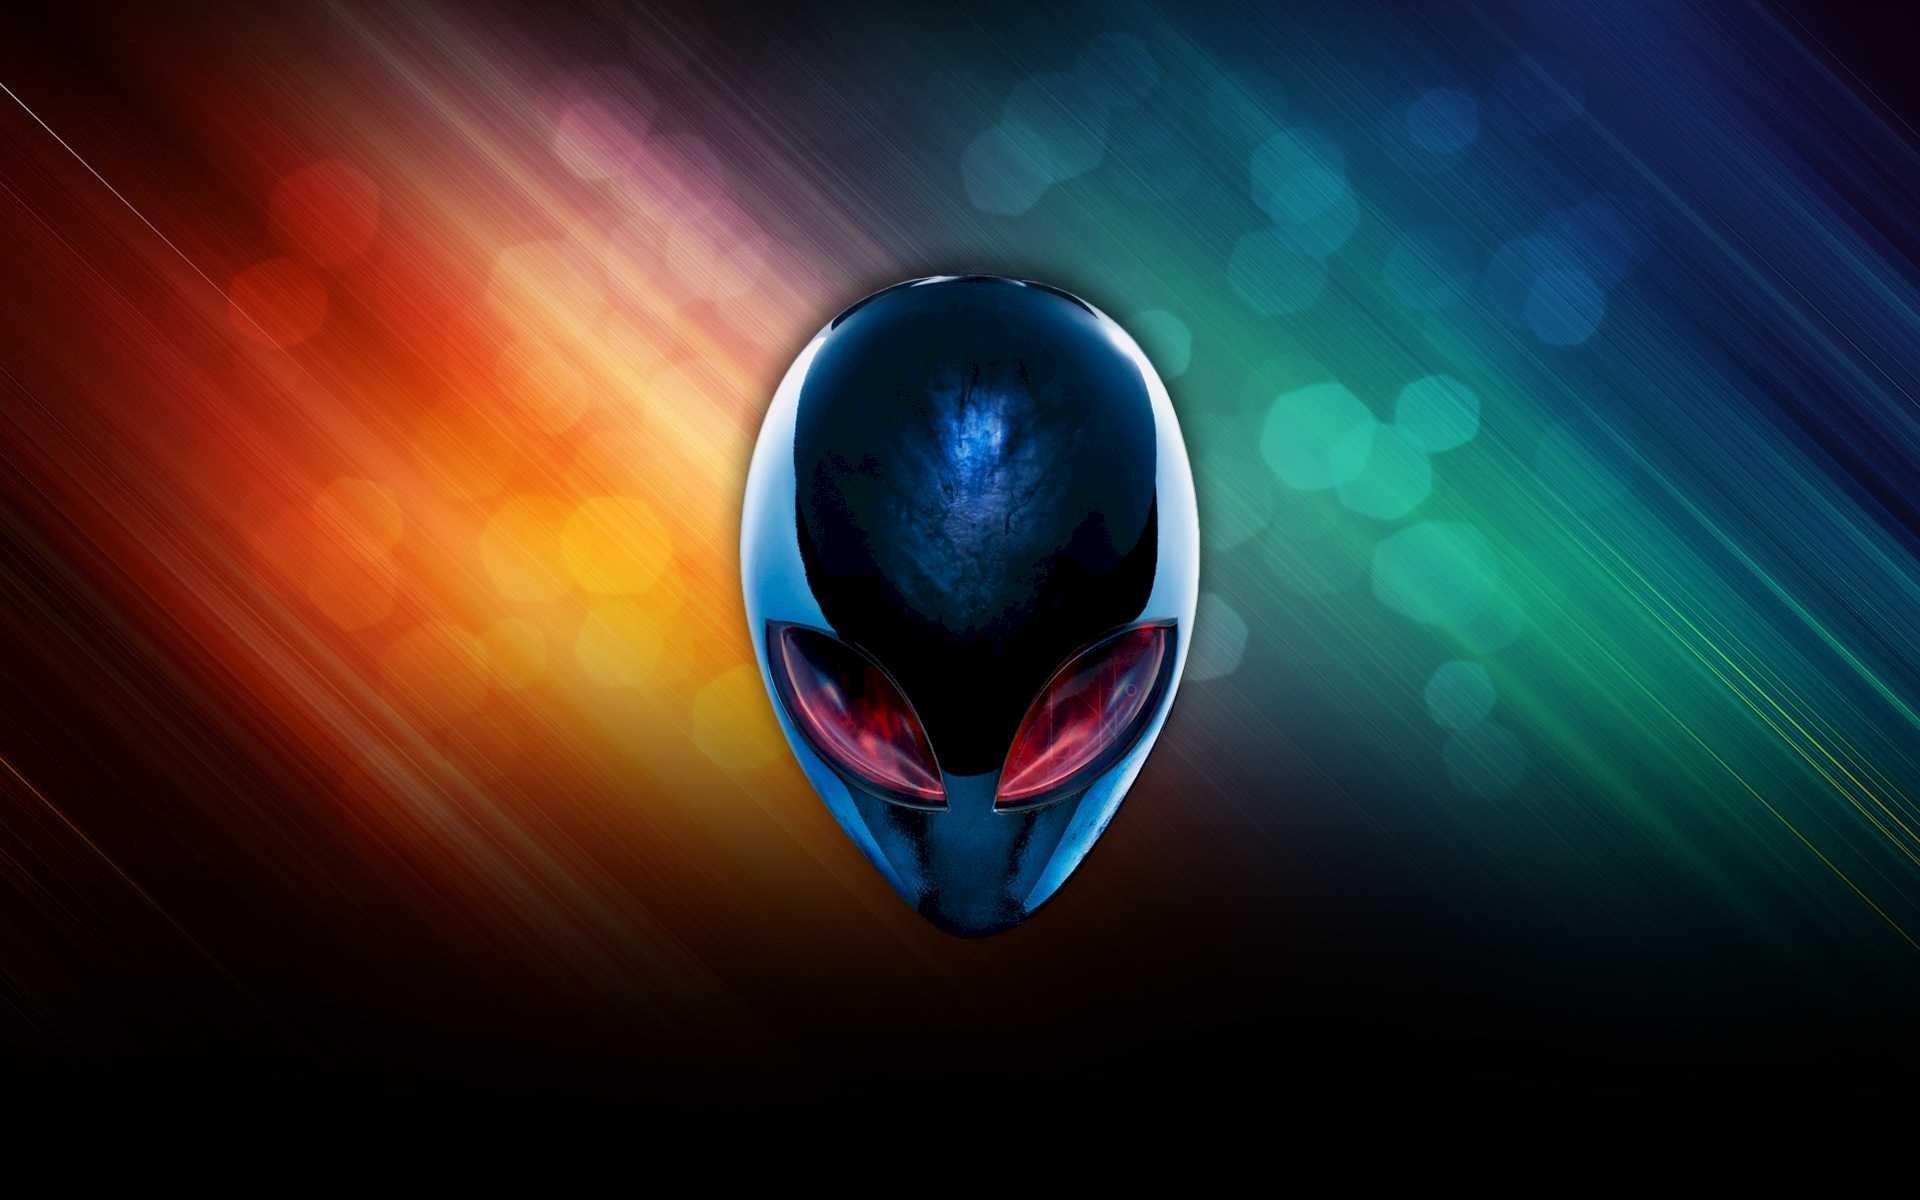 Sci Fi Iphone Wallpaper Alienware Wallpaper 183 ① Download Free Stunning Full Hd